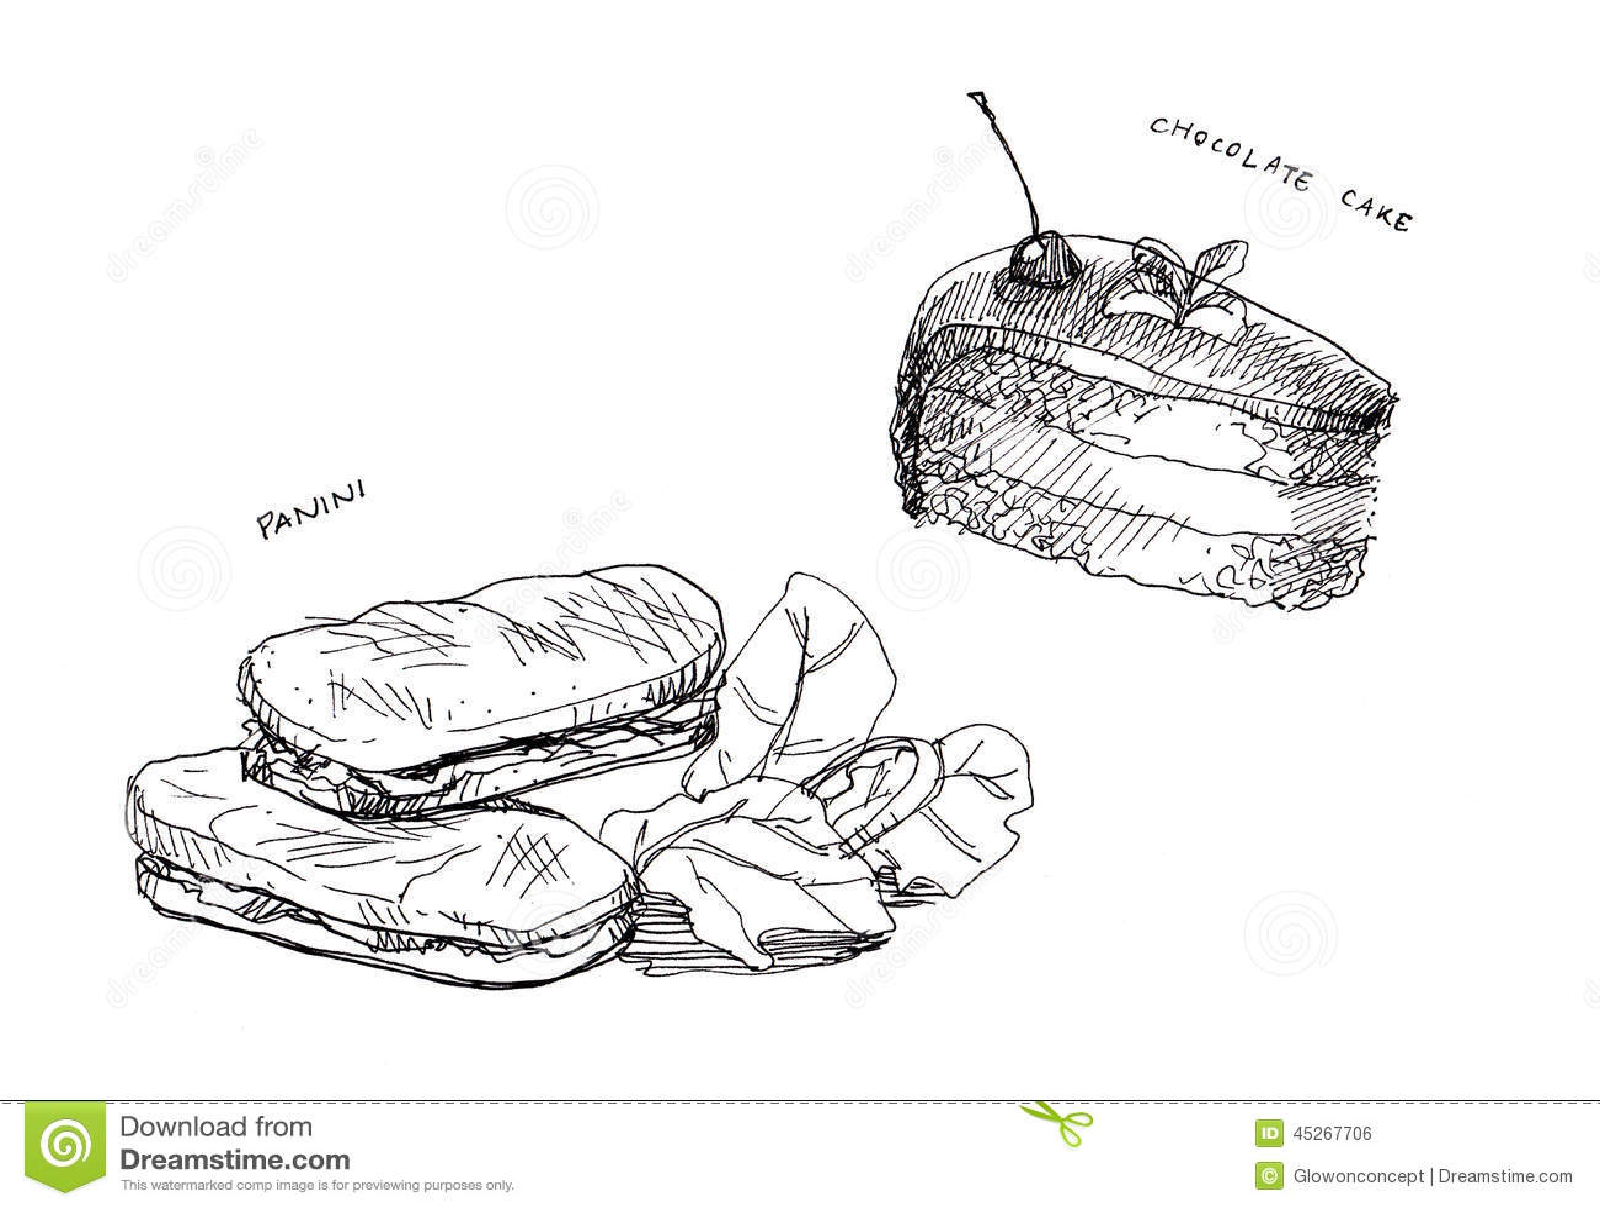 Panini And Cake Chocolate Line Drawing Stock Illustration